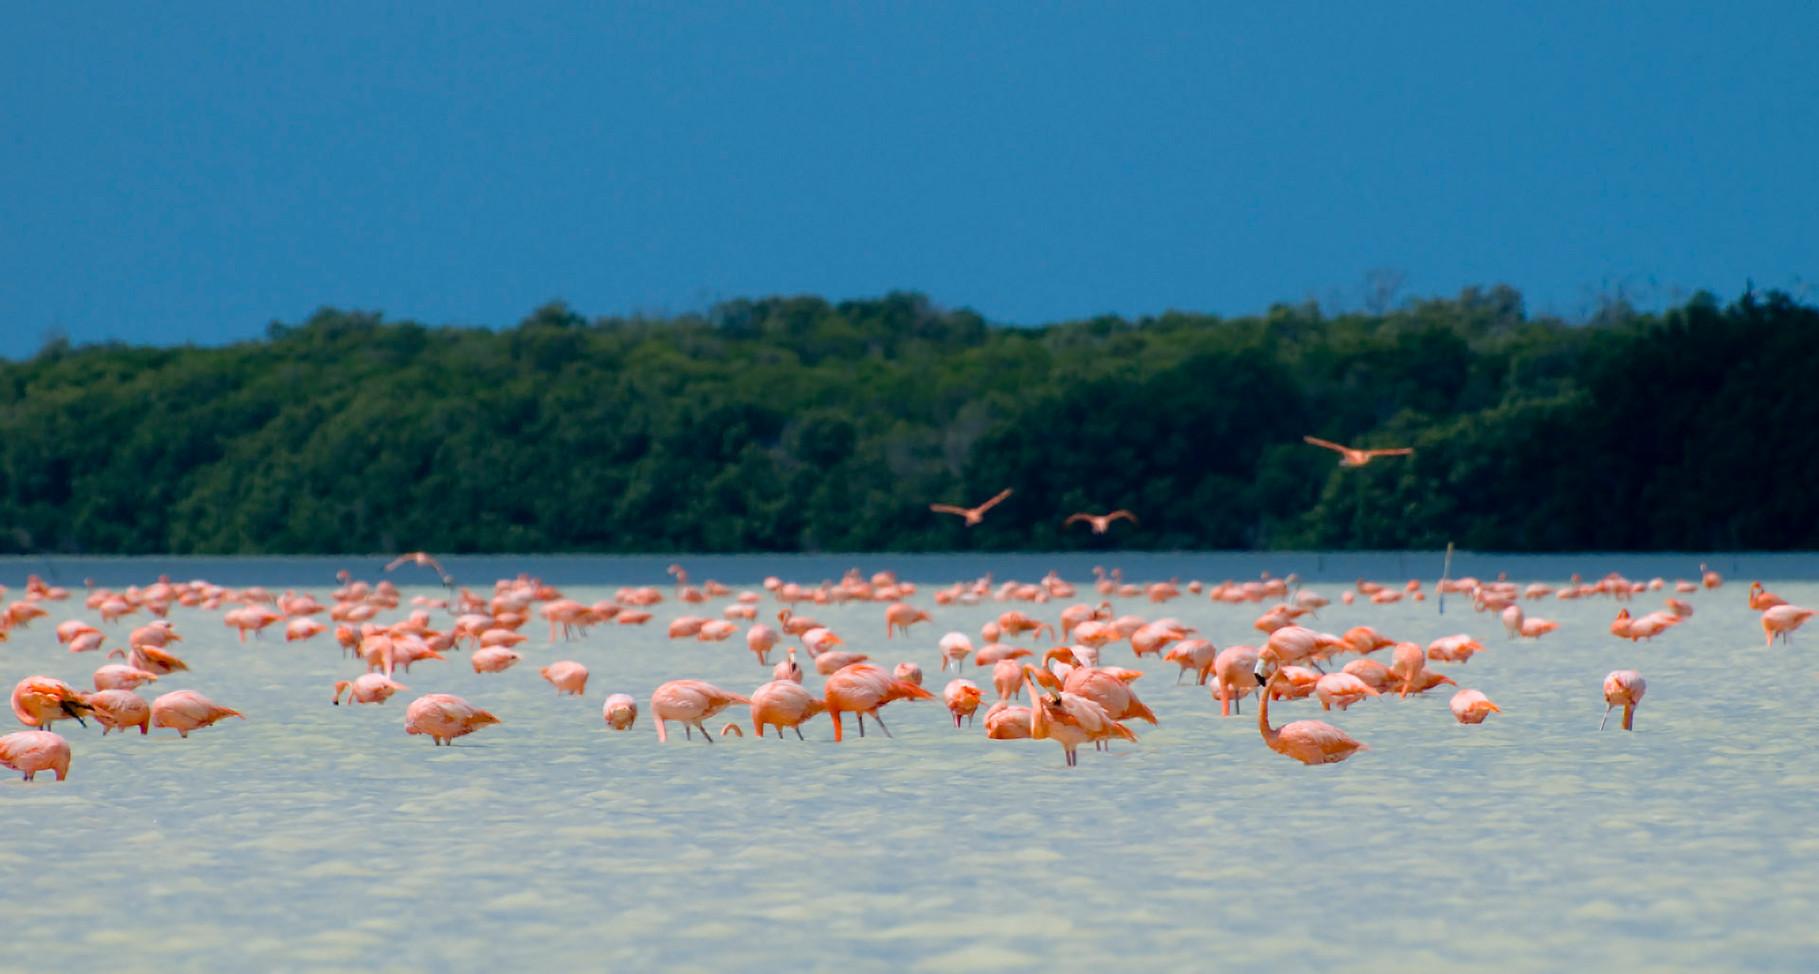 Flamingos [Mexico, 2009]